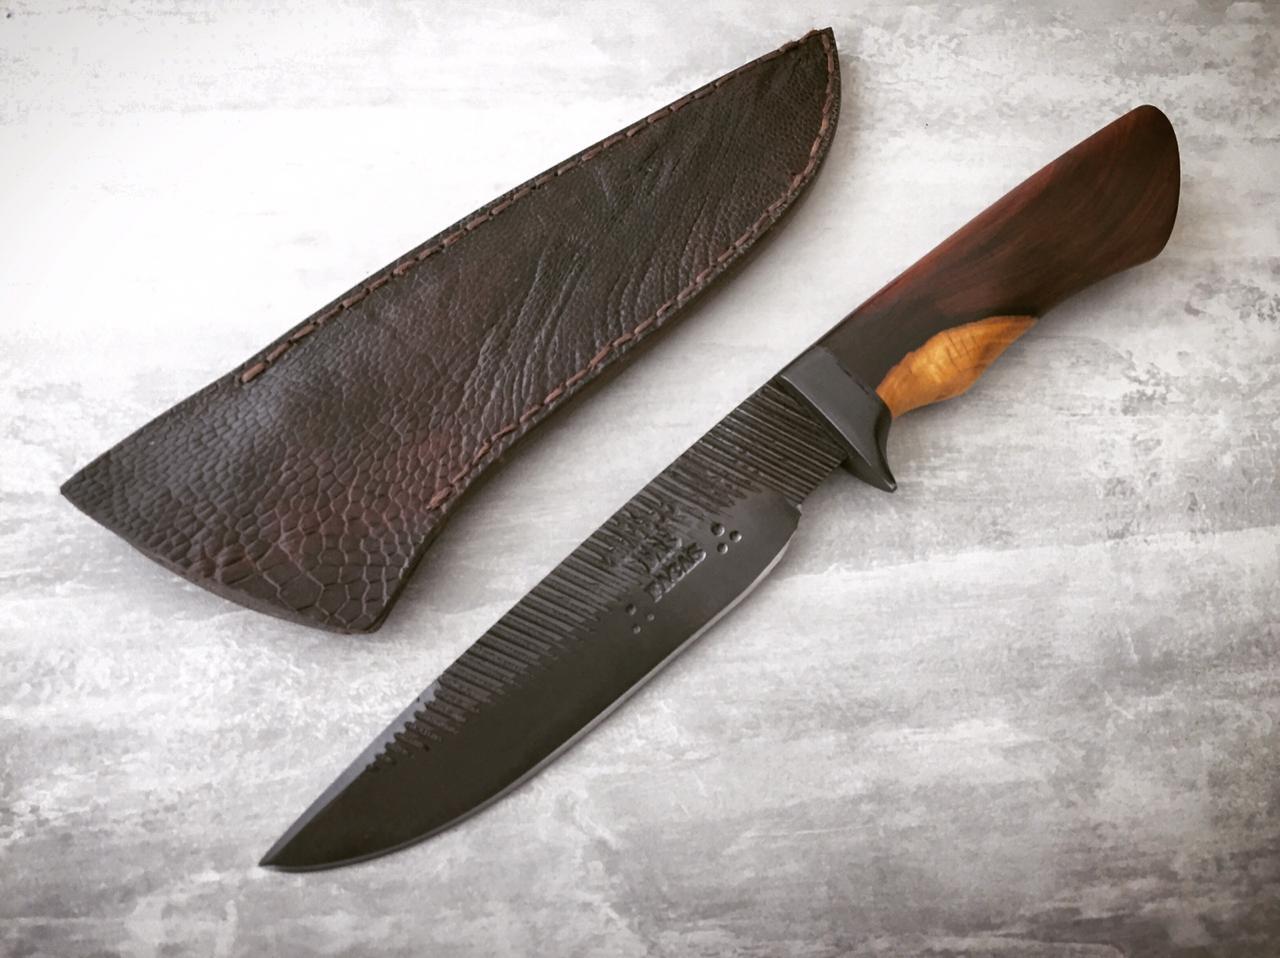 Faca artesanal esportiva hunter forjada de lima antiga 6 polegadas